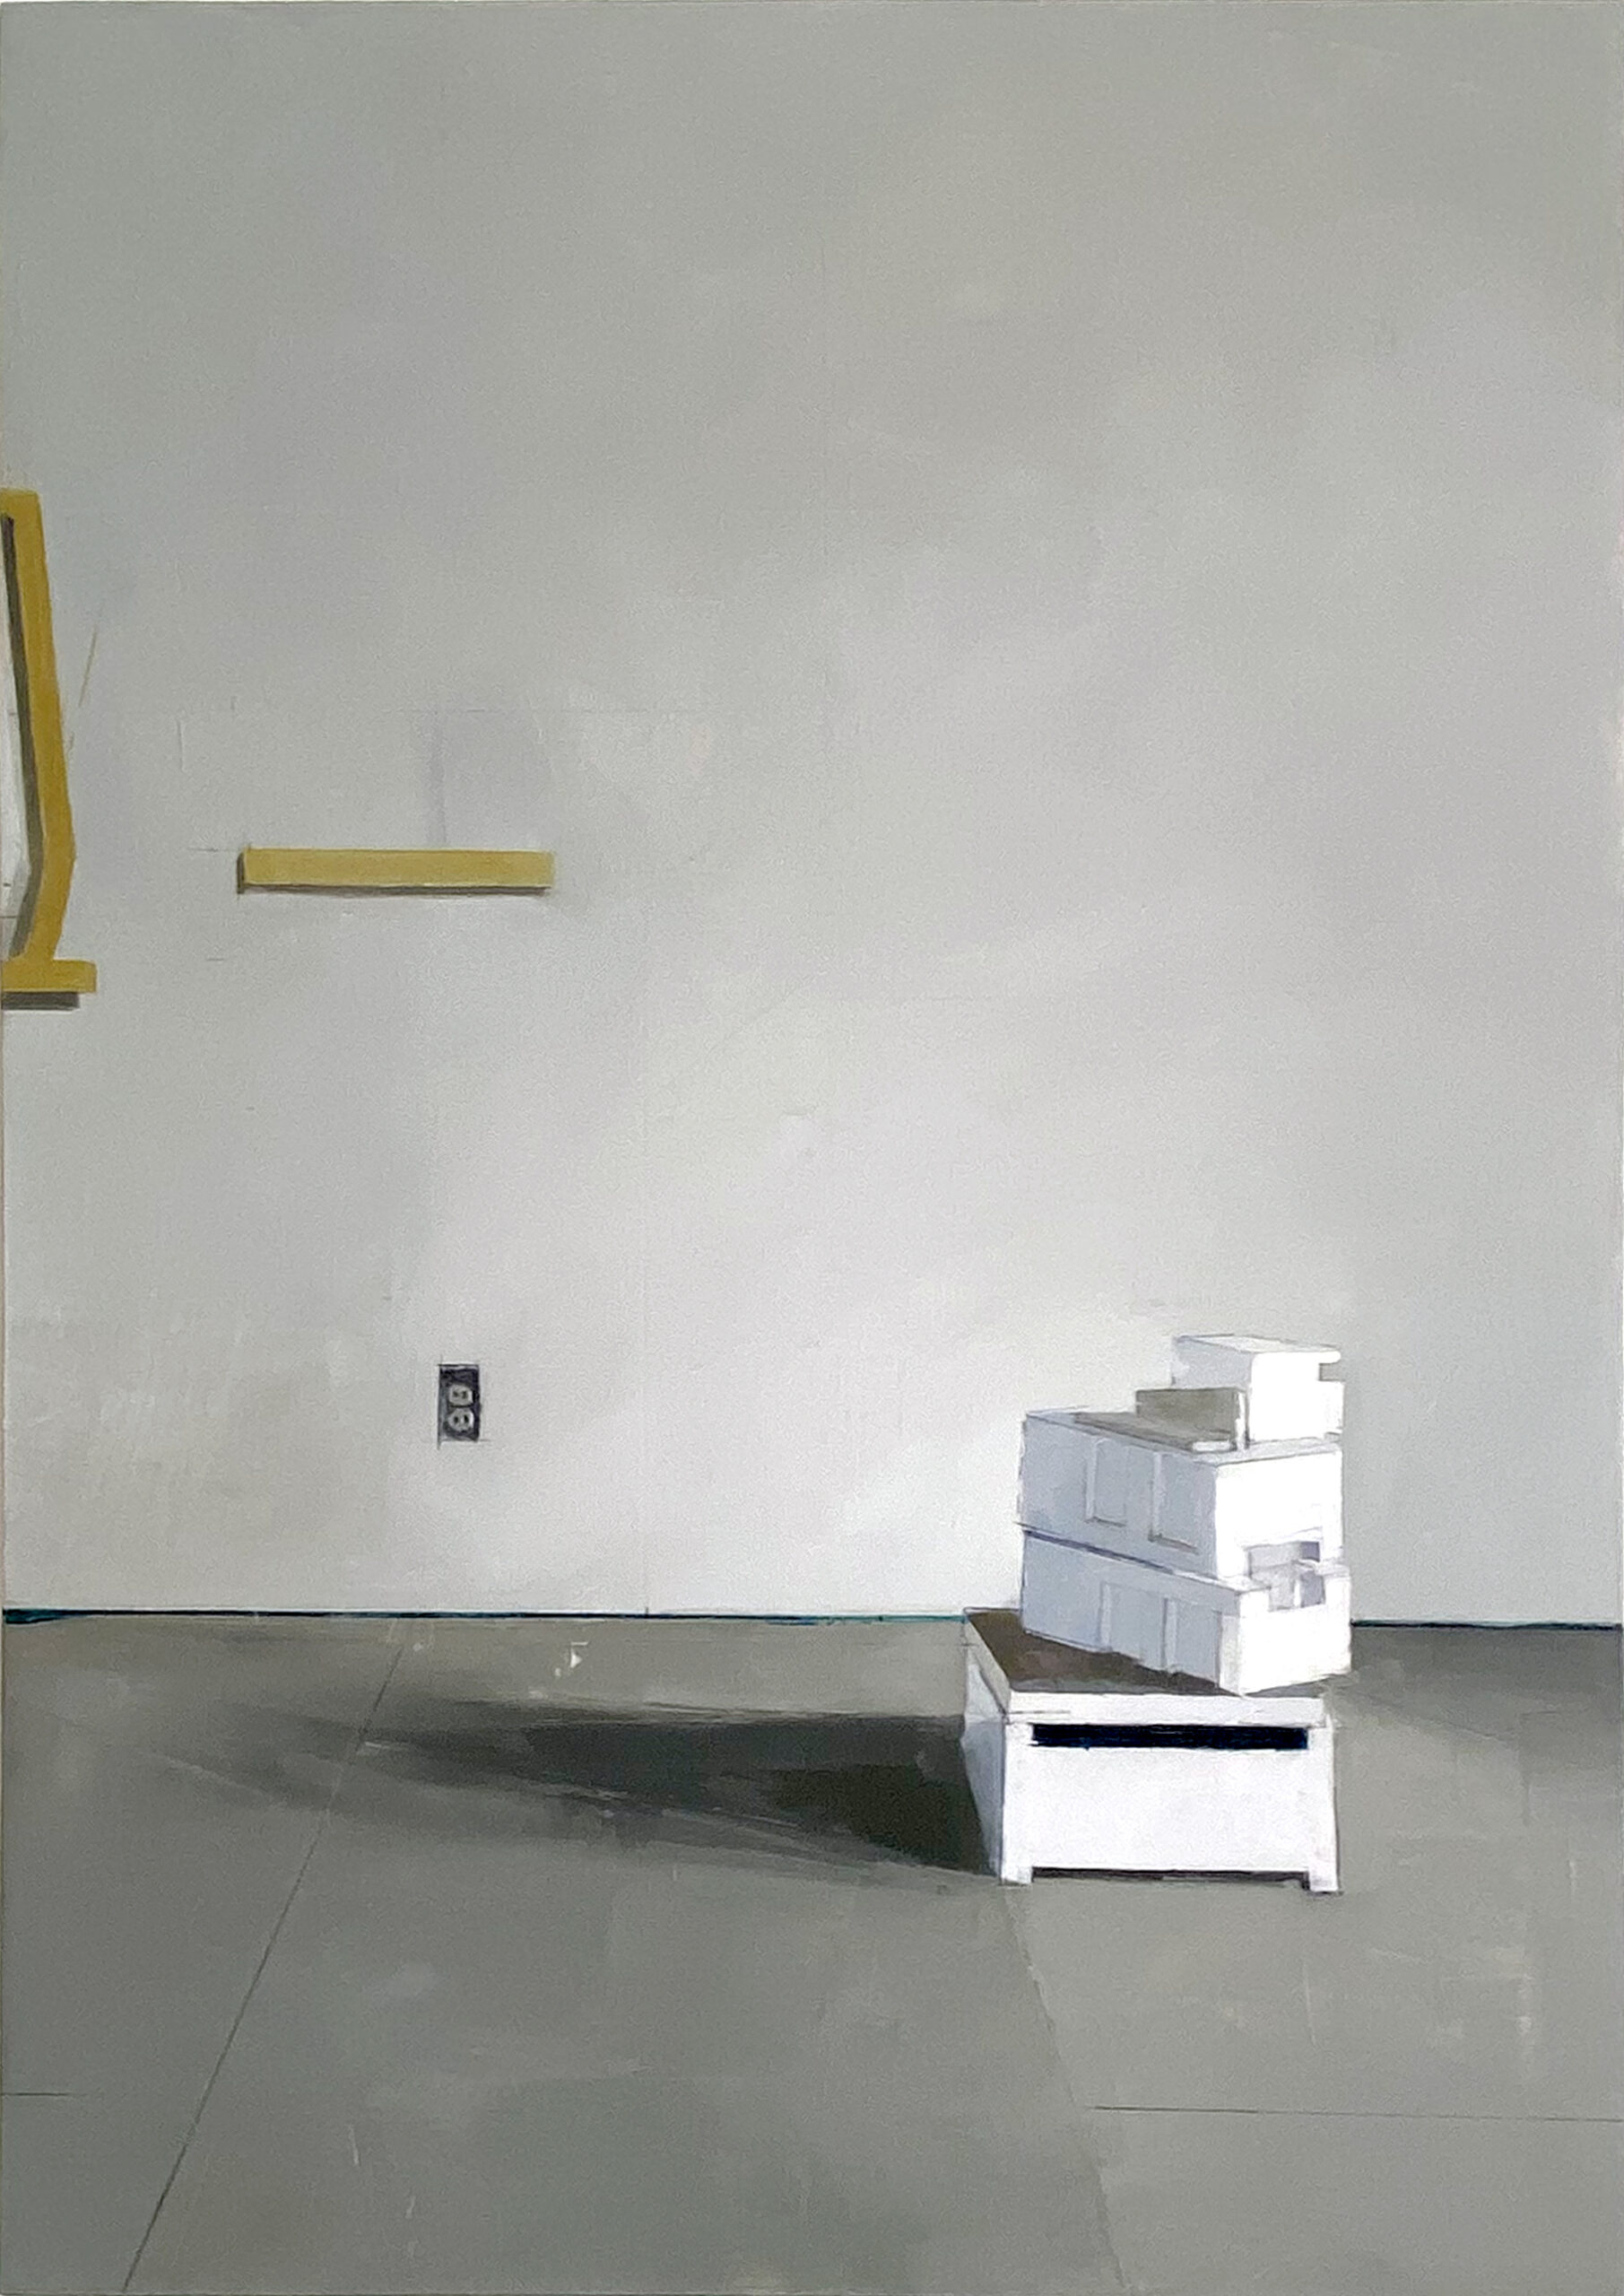 Jenny Brillhart, Off-center Stack, 2021